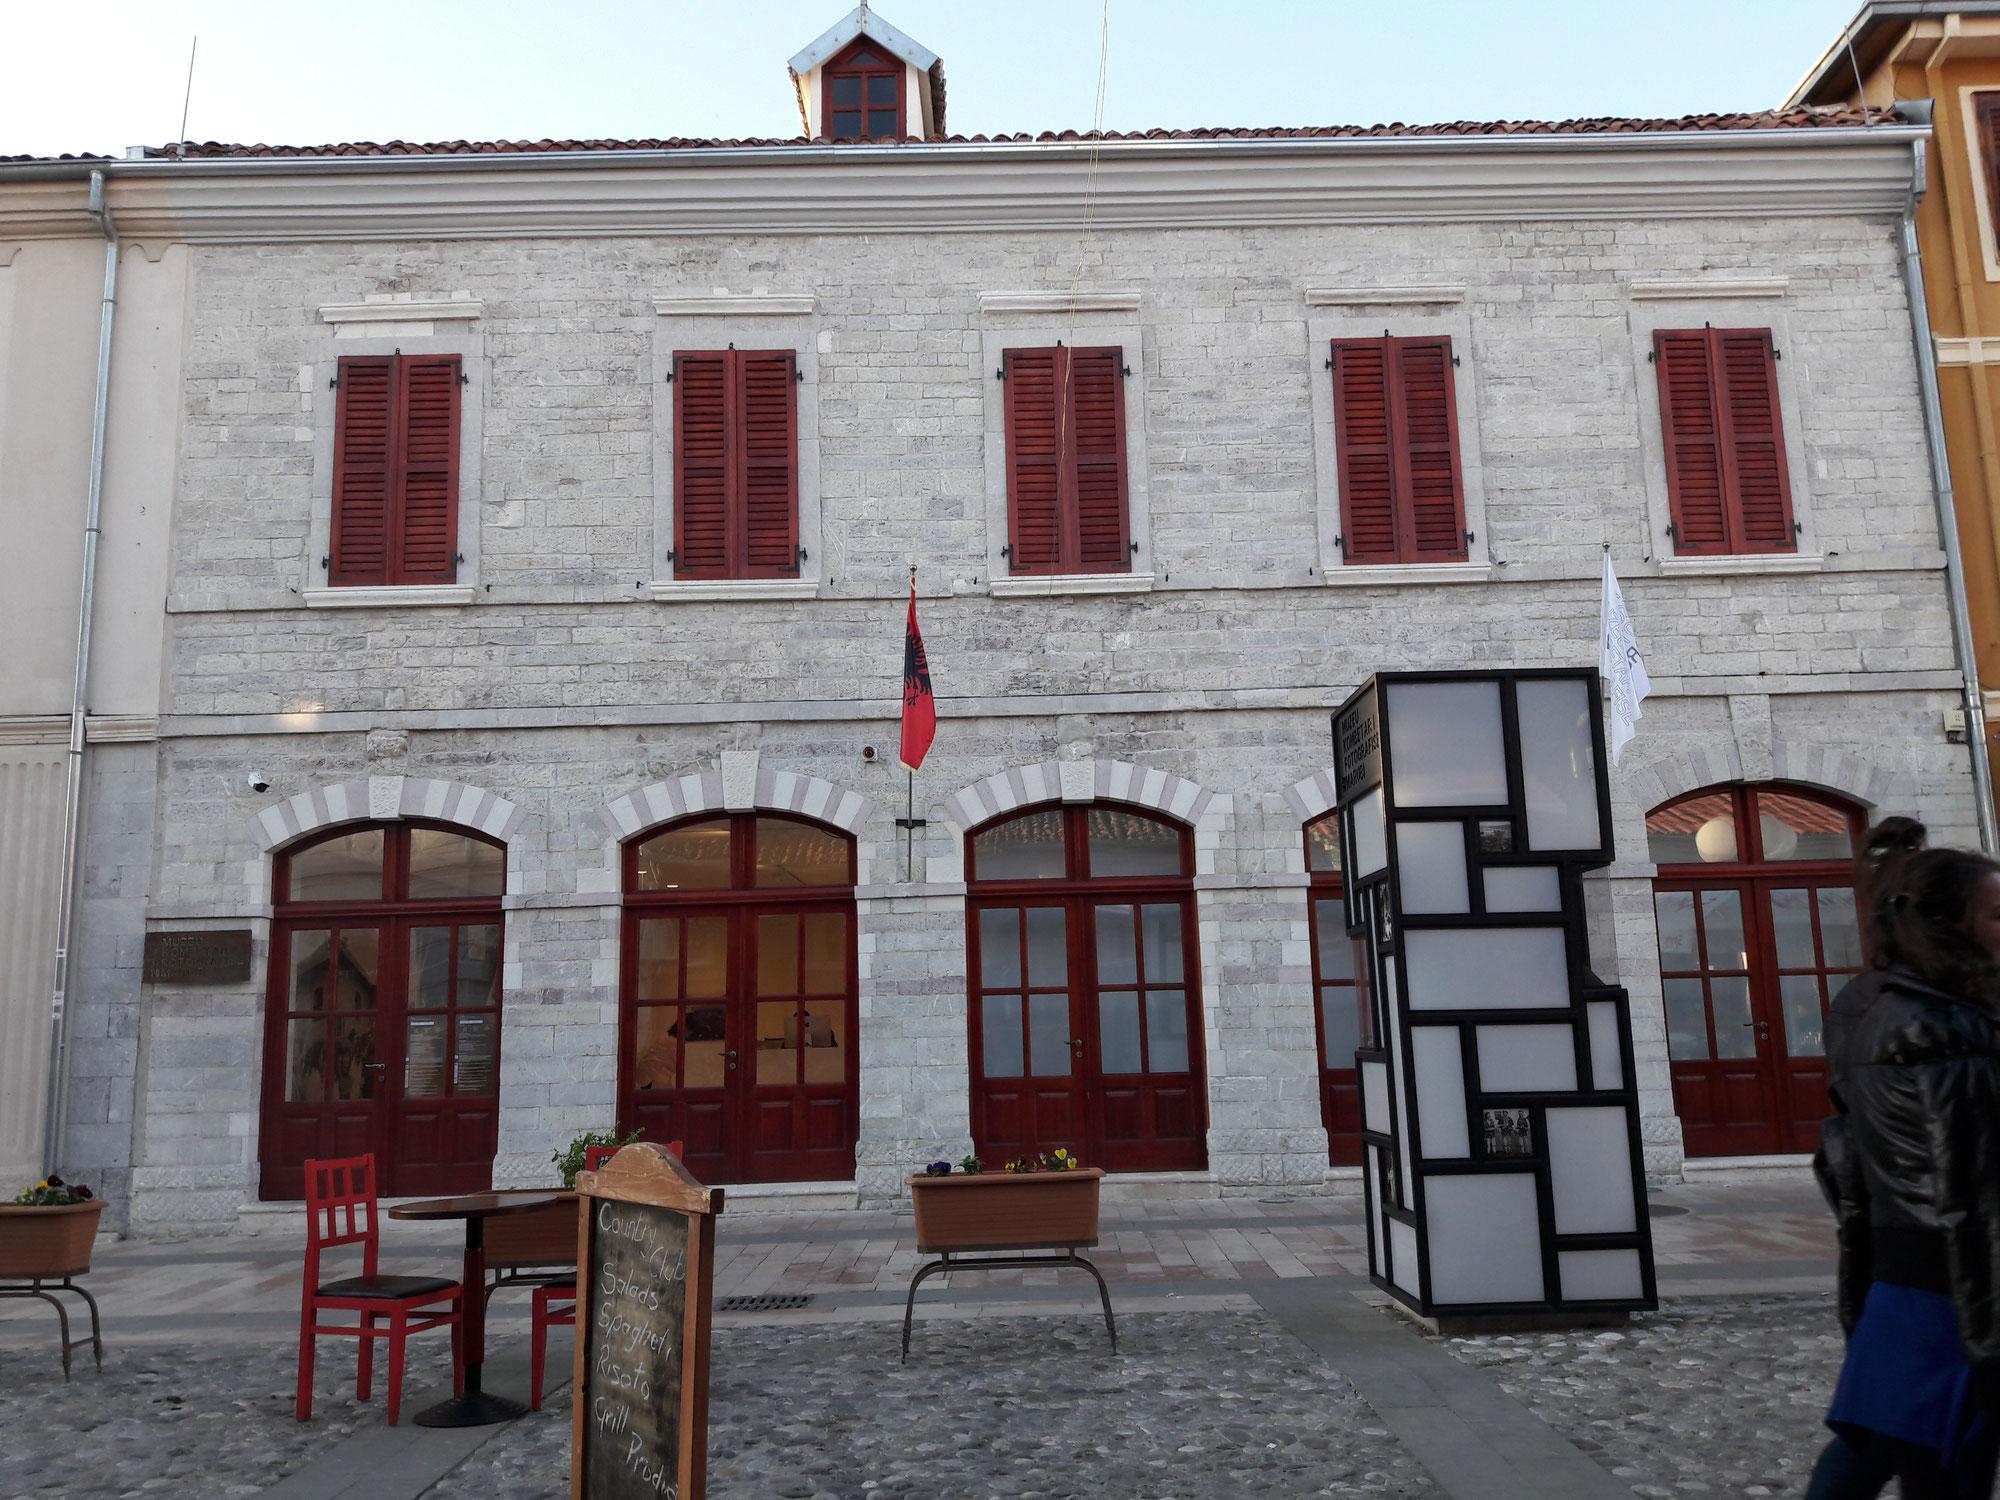 Albanie : la photothèque Marubi